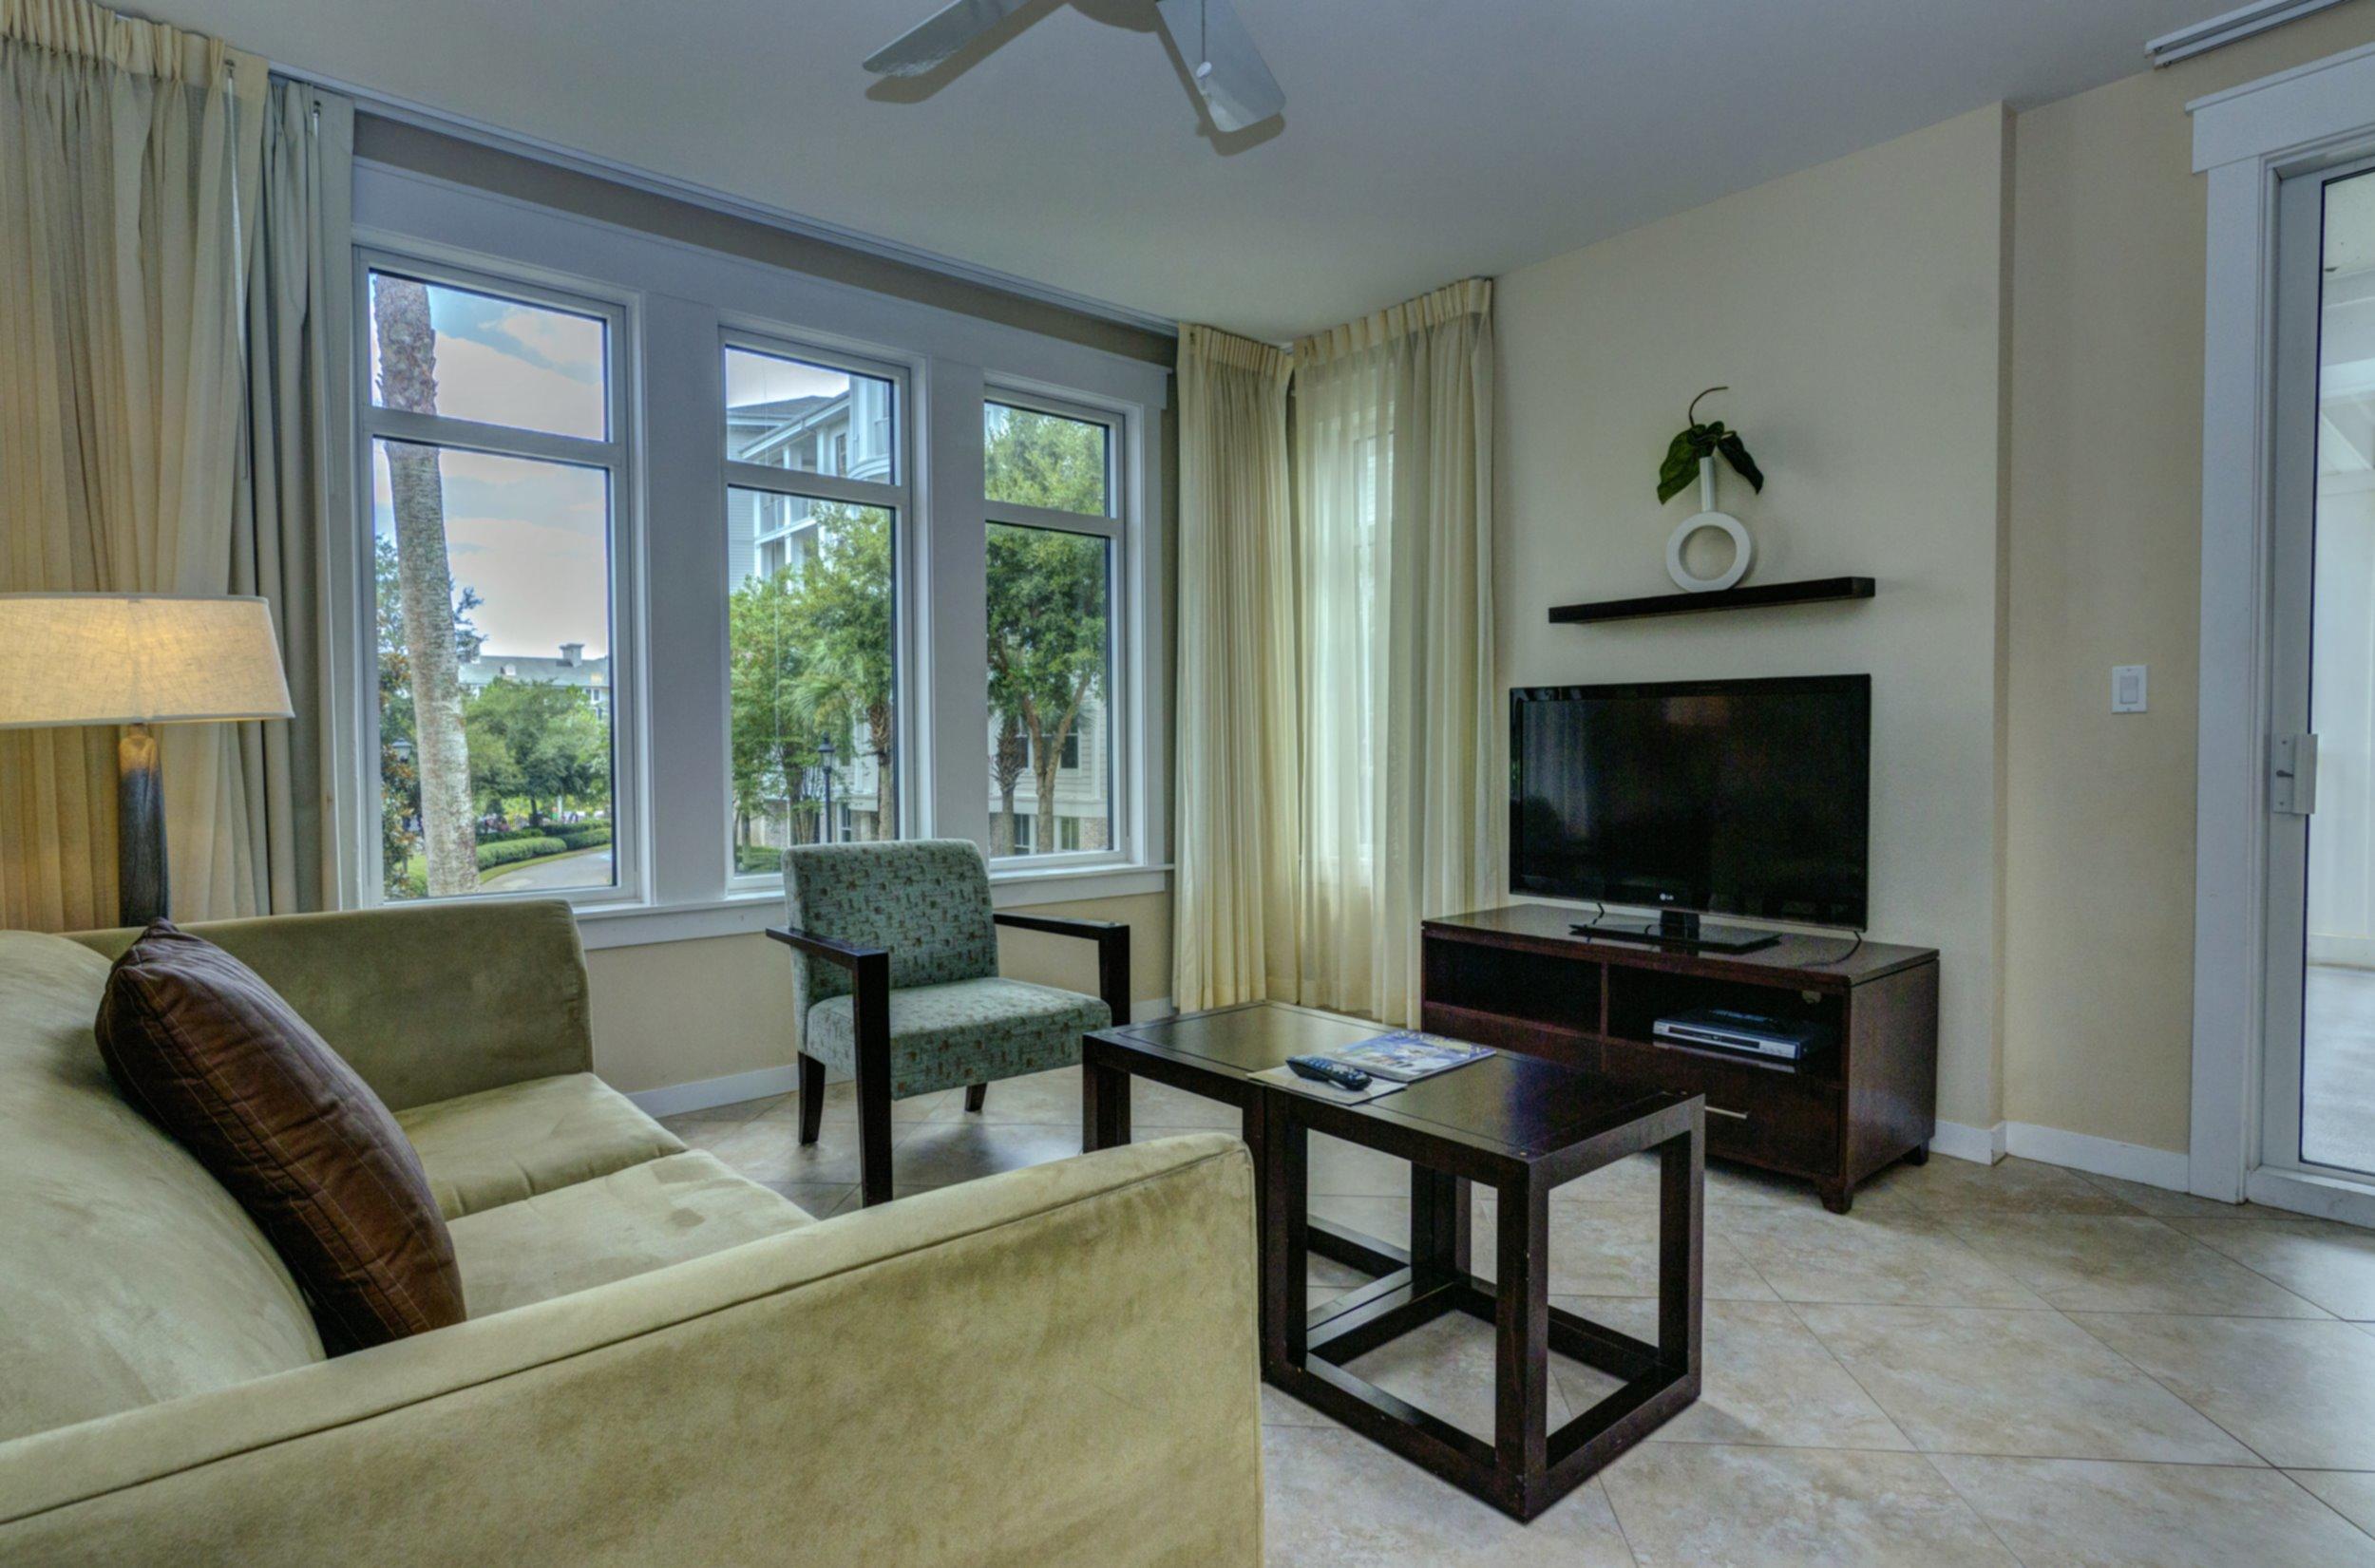 A 2 Bedroom 2 Bedroom Elation Condominium